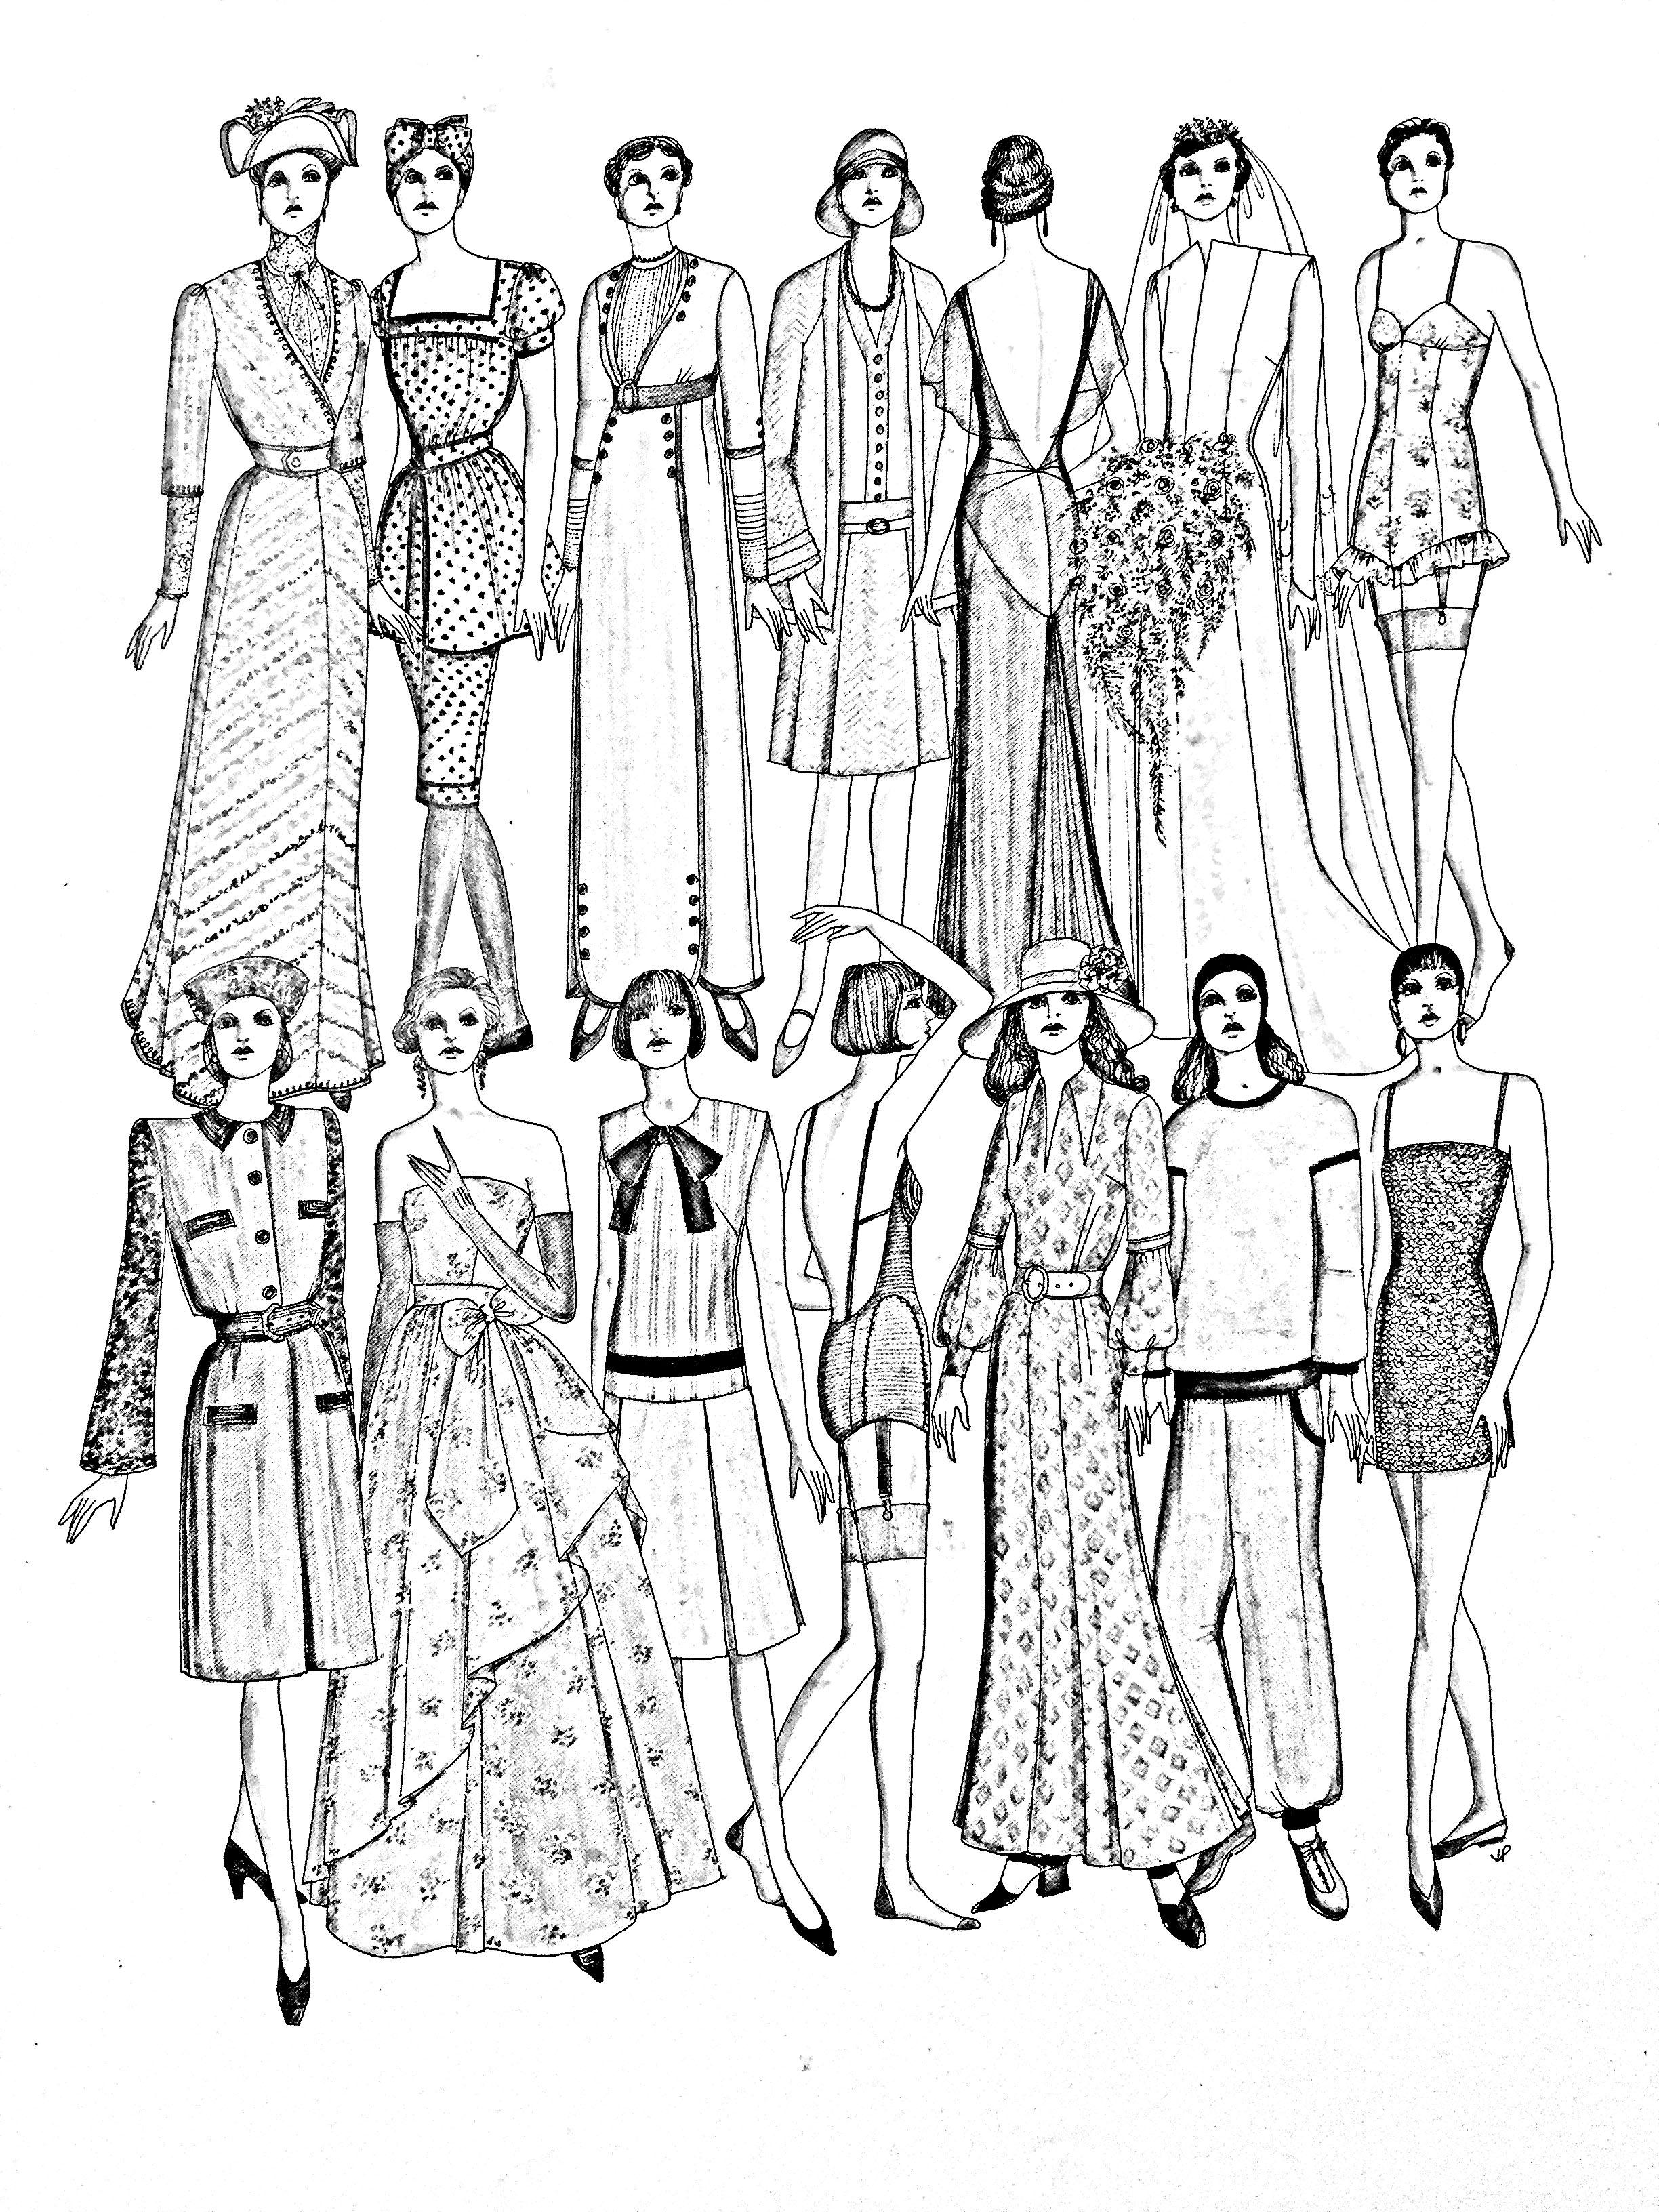 Colorear para adultos : Fashion & clothing - 19